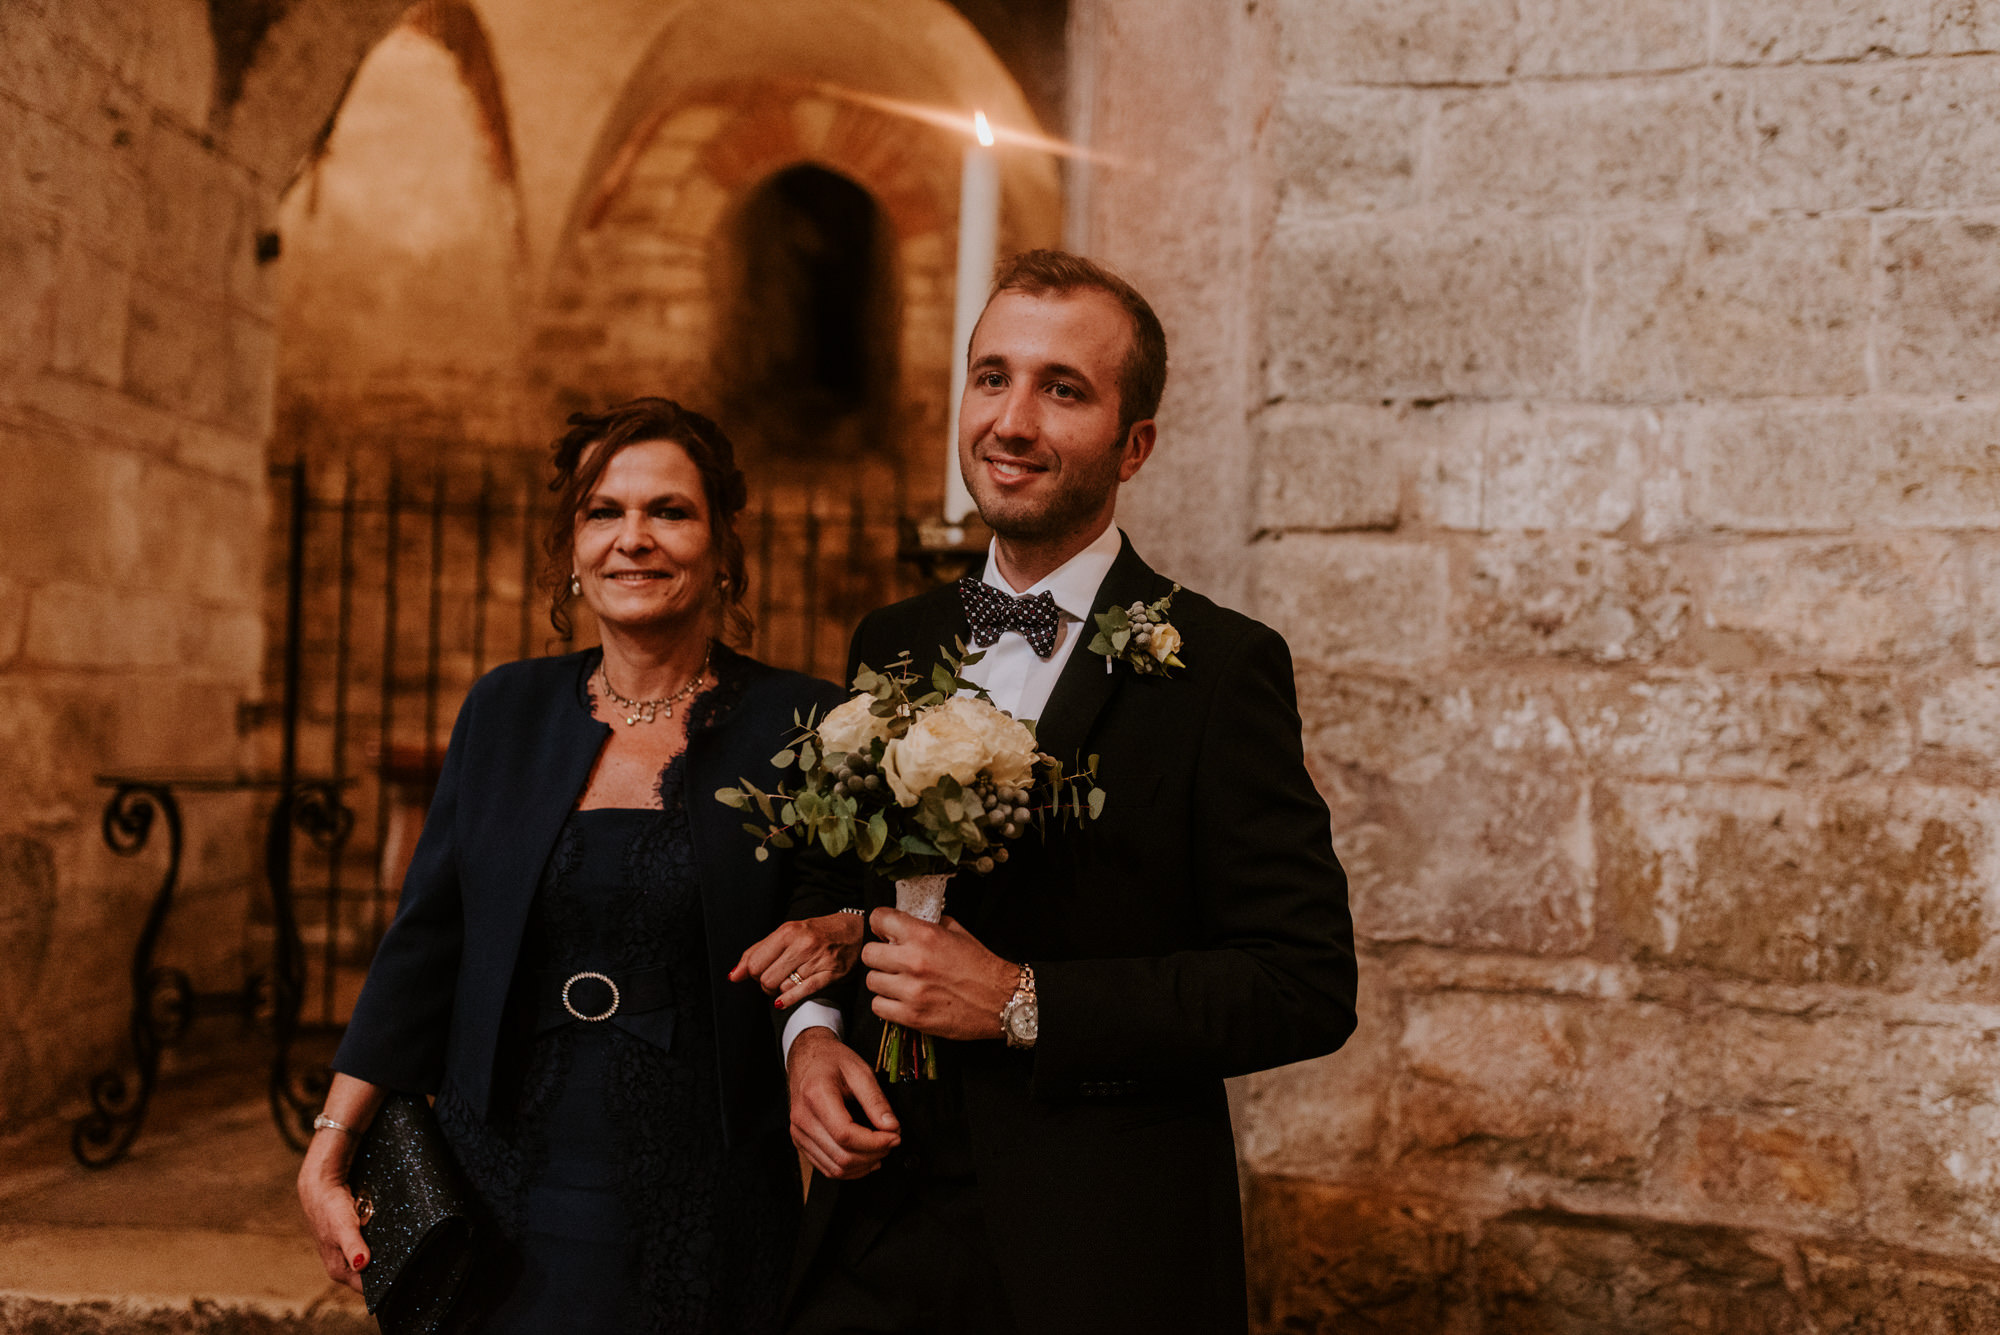 FOTO+PHOTO+BODA+WEDDING+ITALIA+ITALY+MAURICIO+GARAY+MAURICIOGARAY+WEDDINPHOTOGRAPHER+FOTOGRAFODEBODA-740.jpg